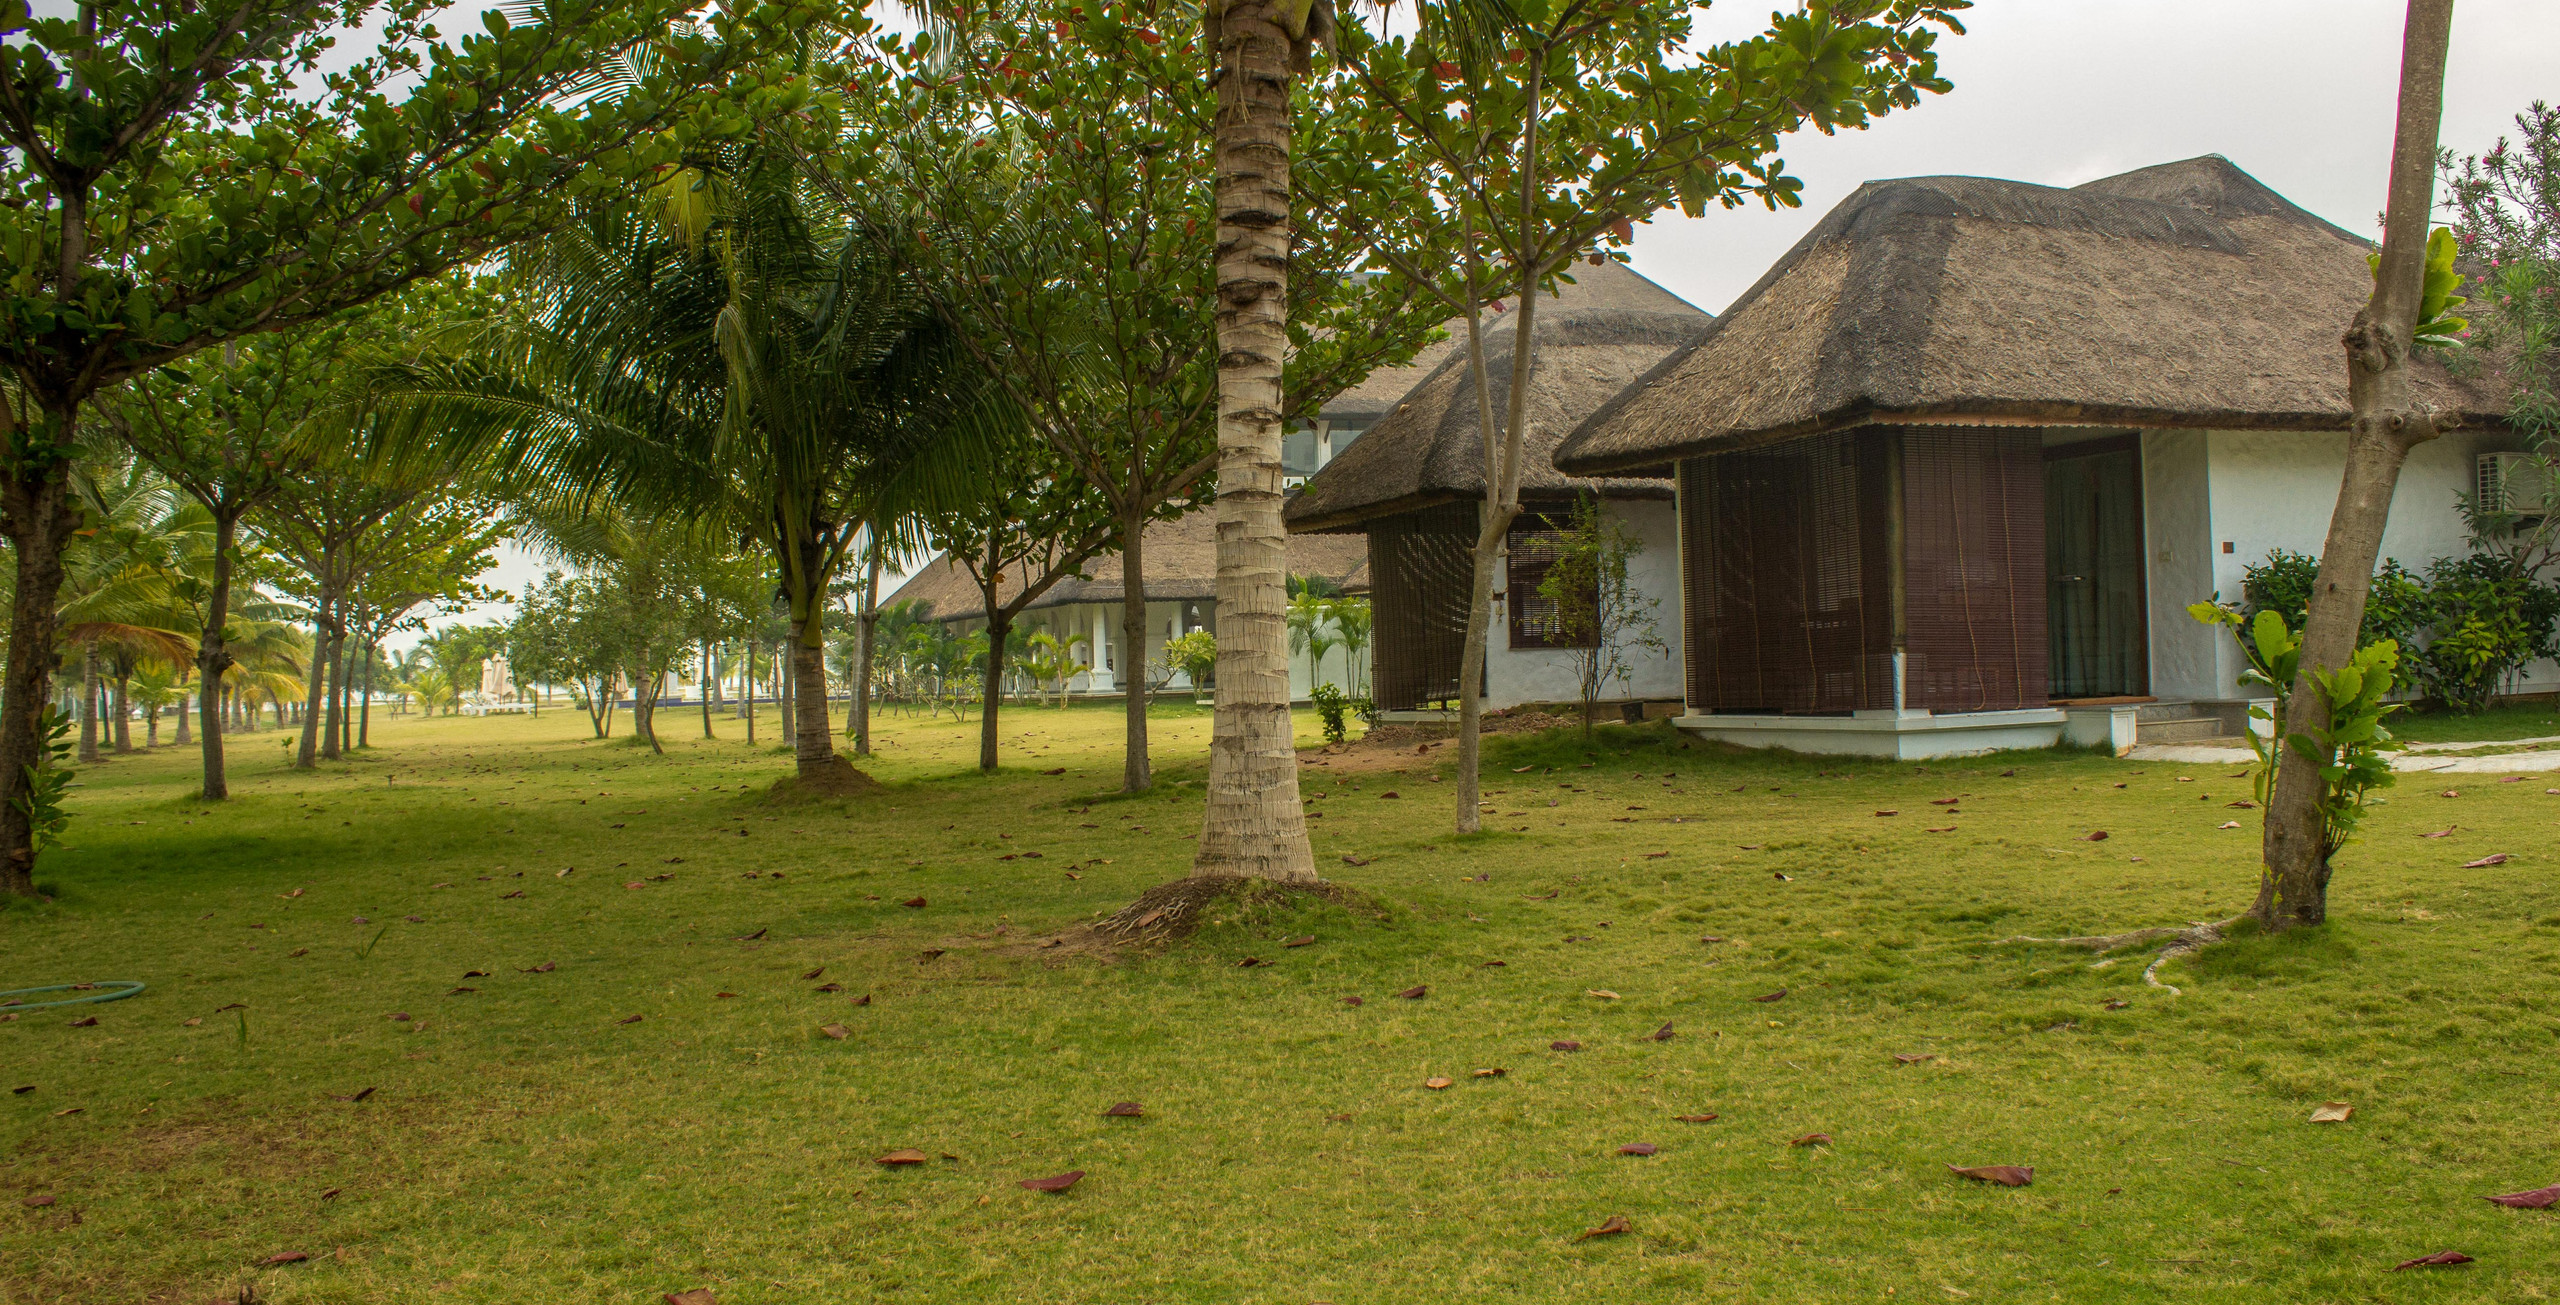 Landscaping_Le Pondy_Fairytale Travel Blog (9)